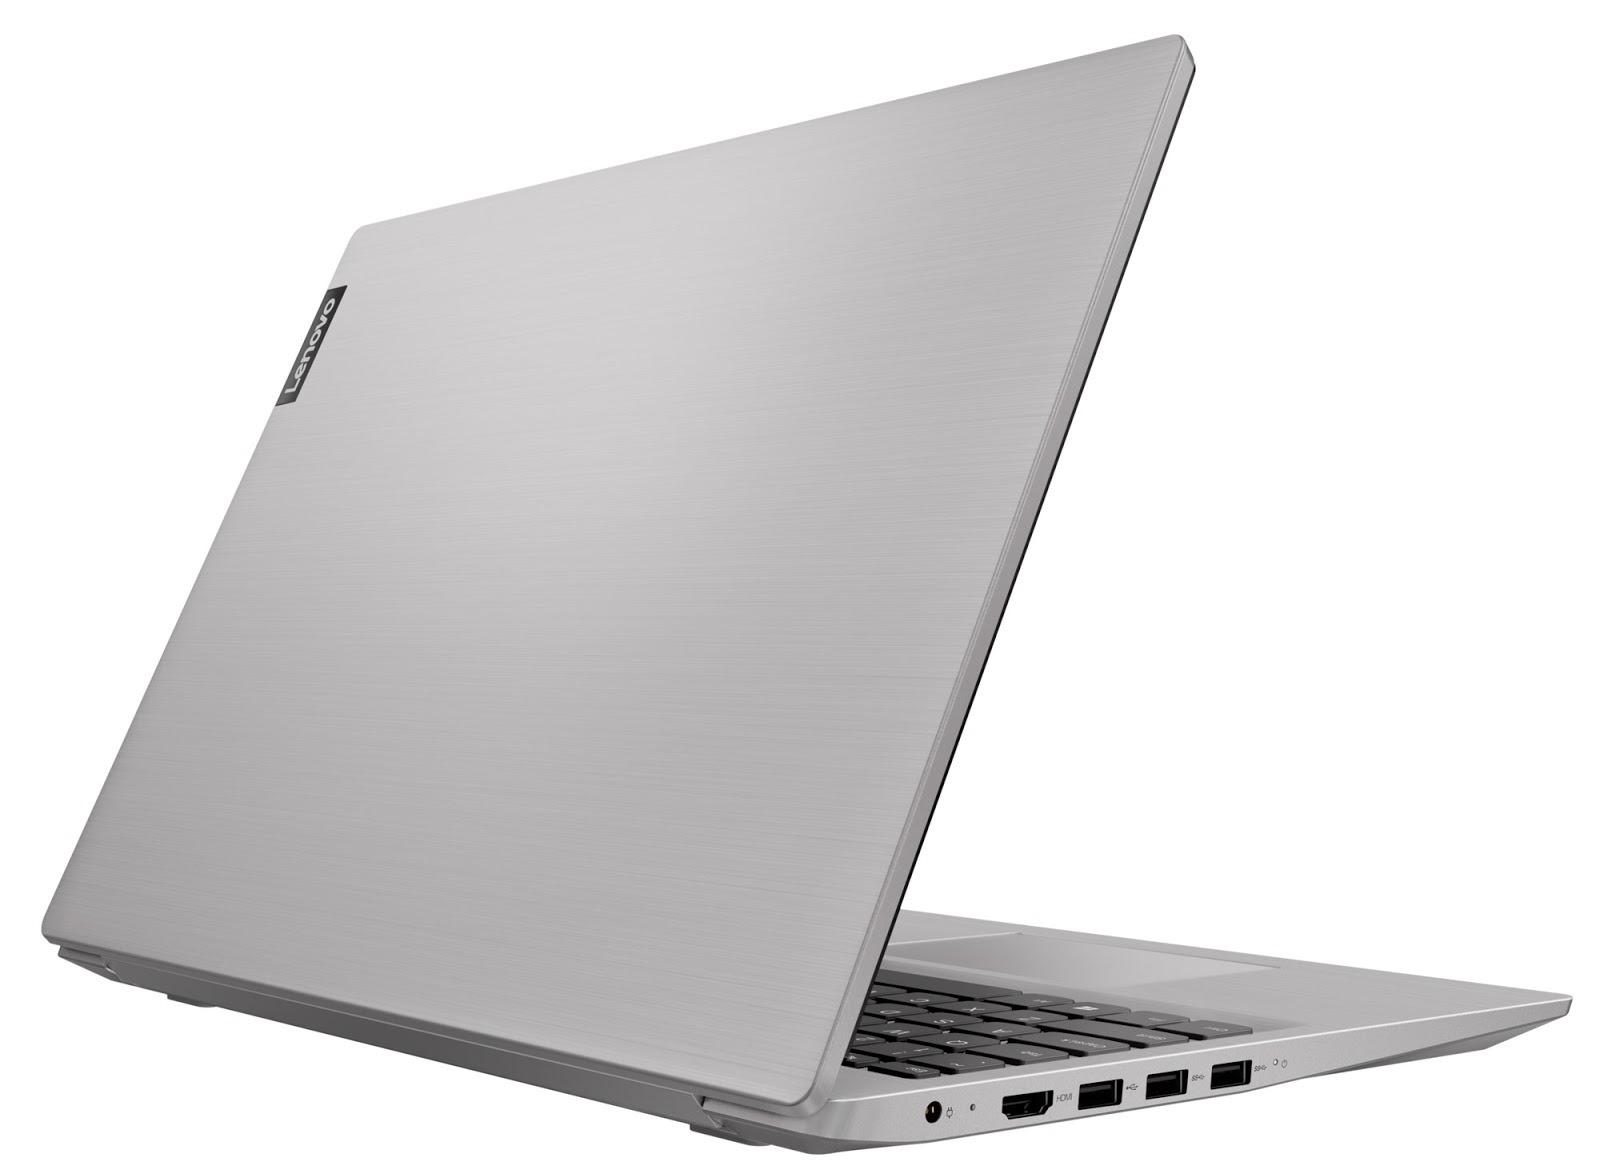 Фото 1. Ноутбук Lenovo ideapad S145-15AST (81N300EYRE)